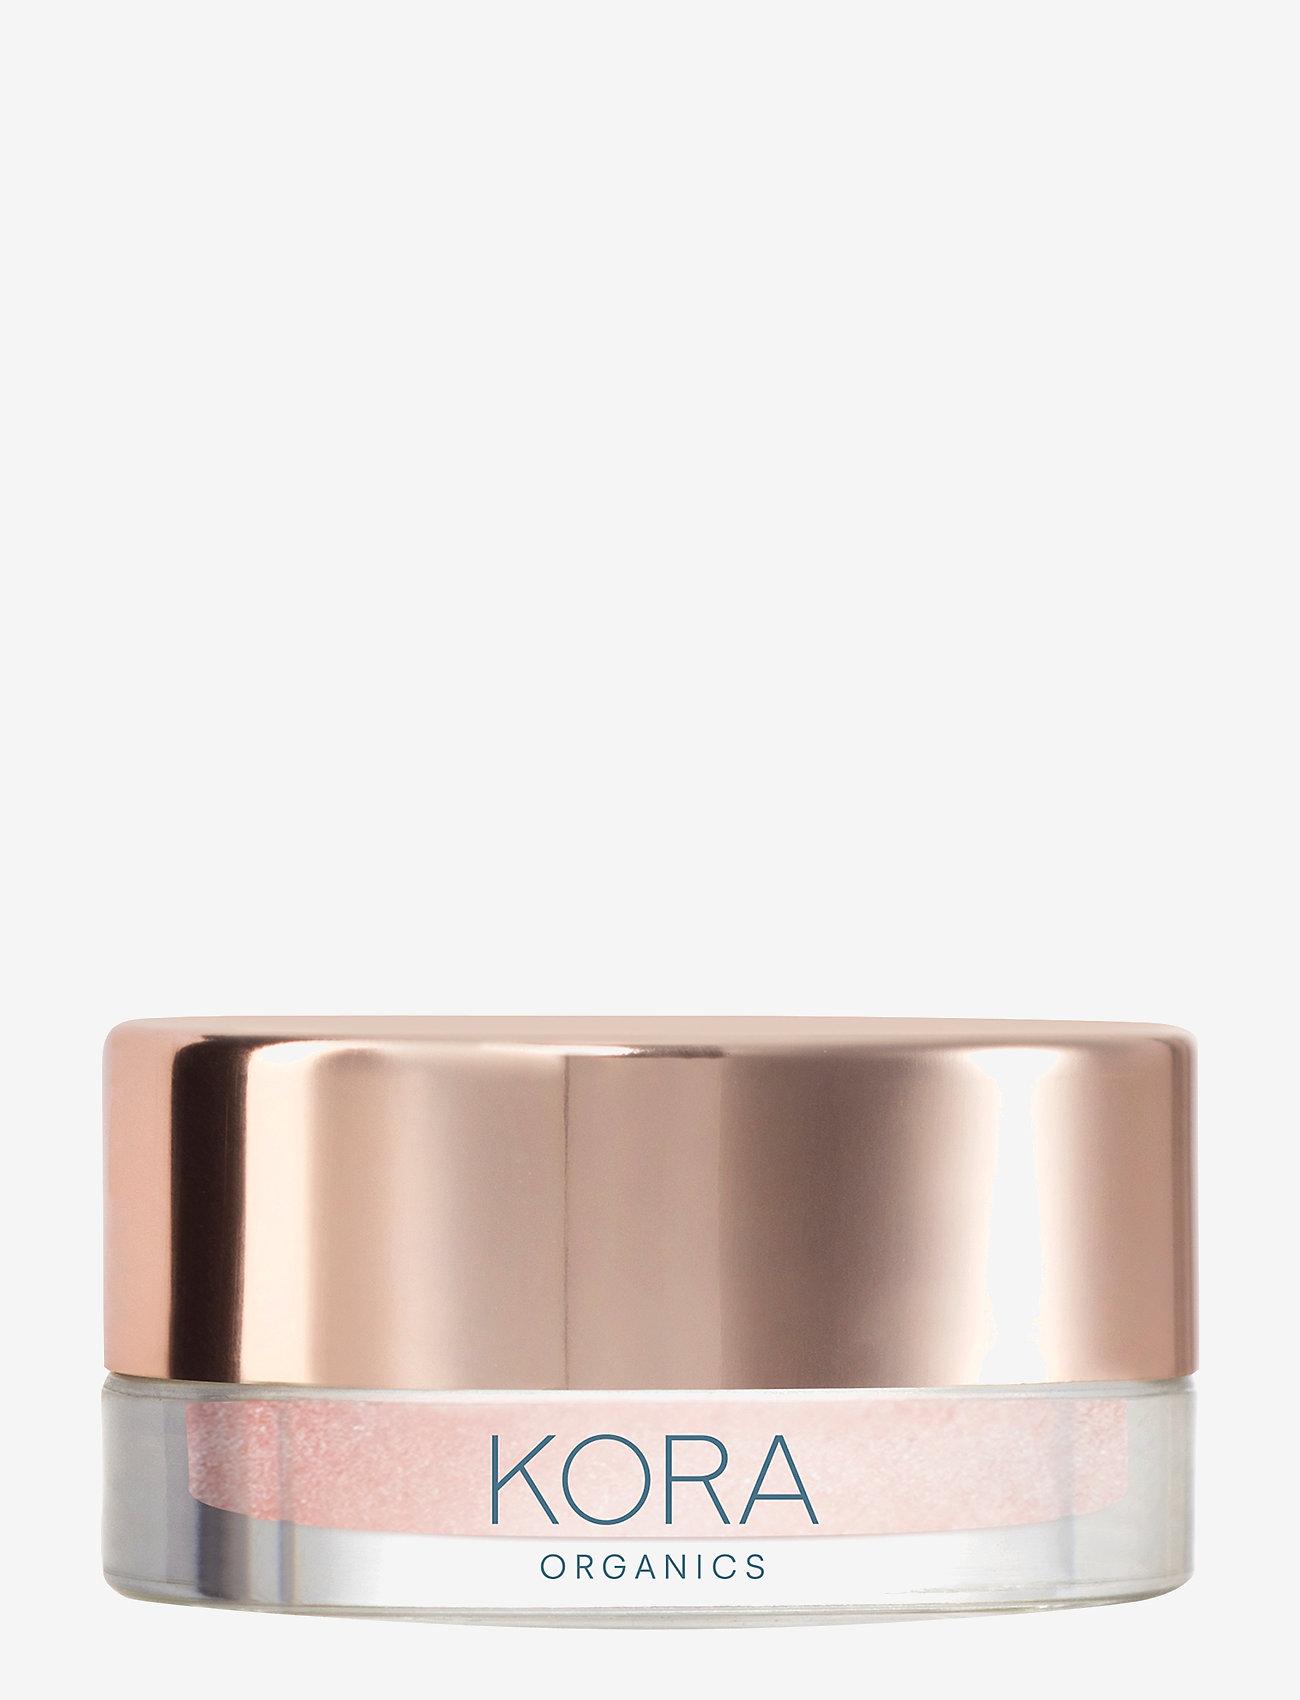 Kora Organics - Rose Quartz Luminizer - highlighter - rose - 0